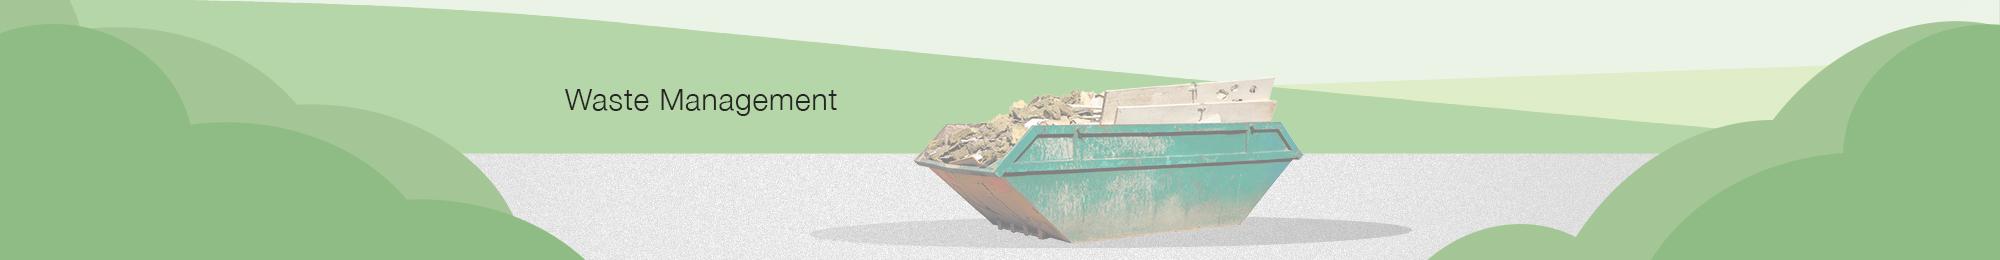 image of waste management